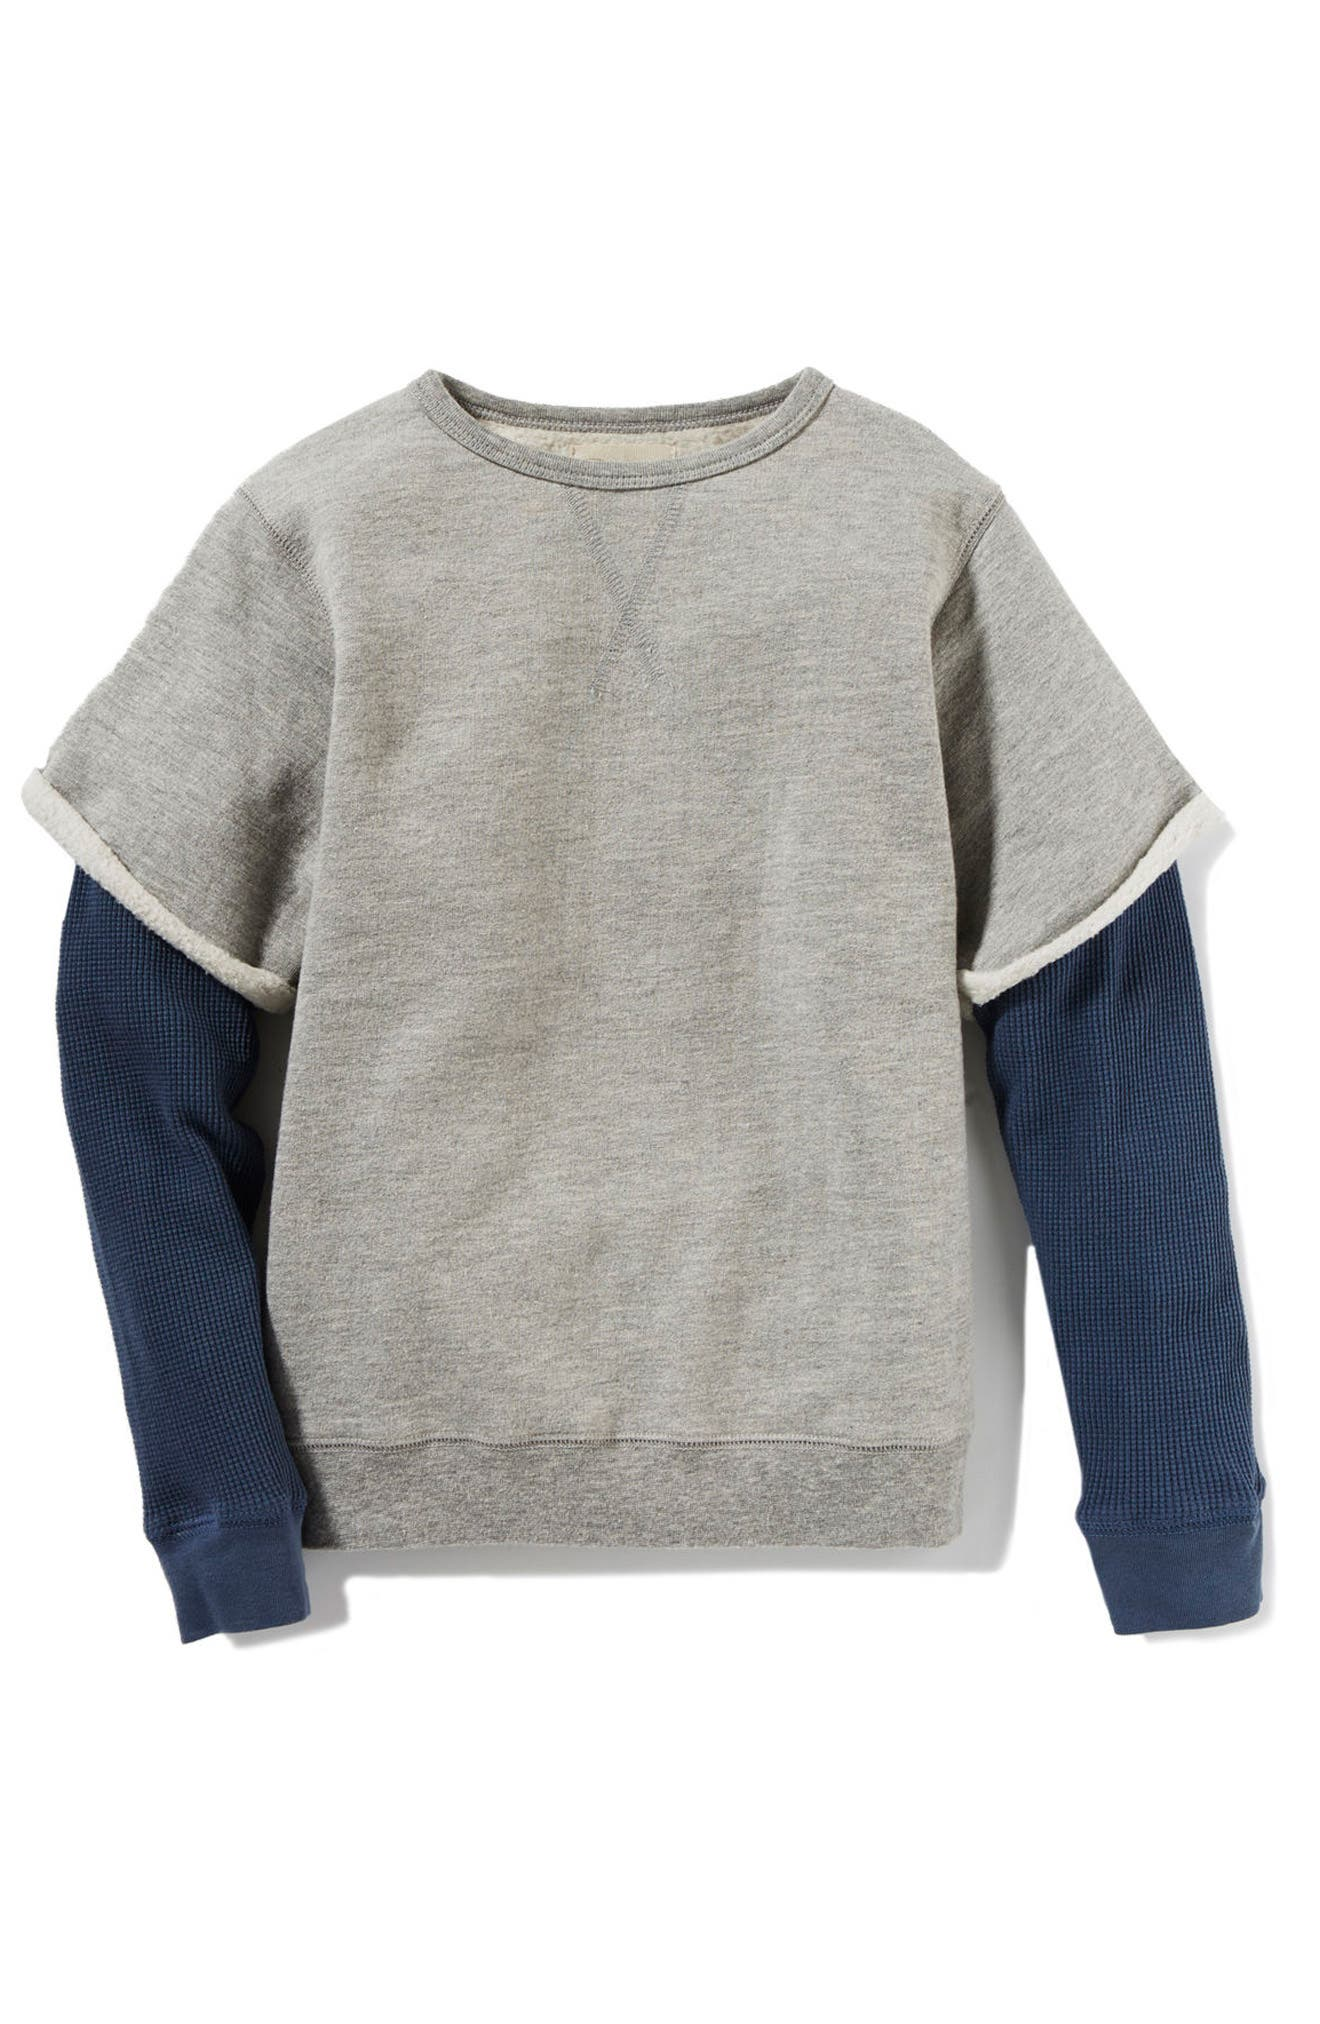 Axel Layer Sweatshirt,                             Main thumbnail 1, color,                             Heather Grey